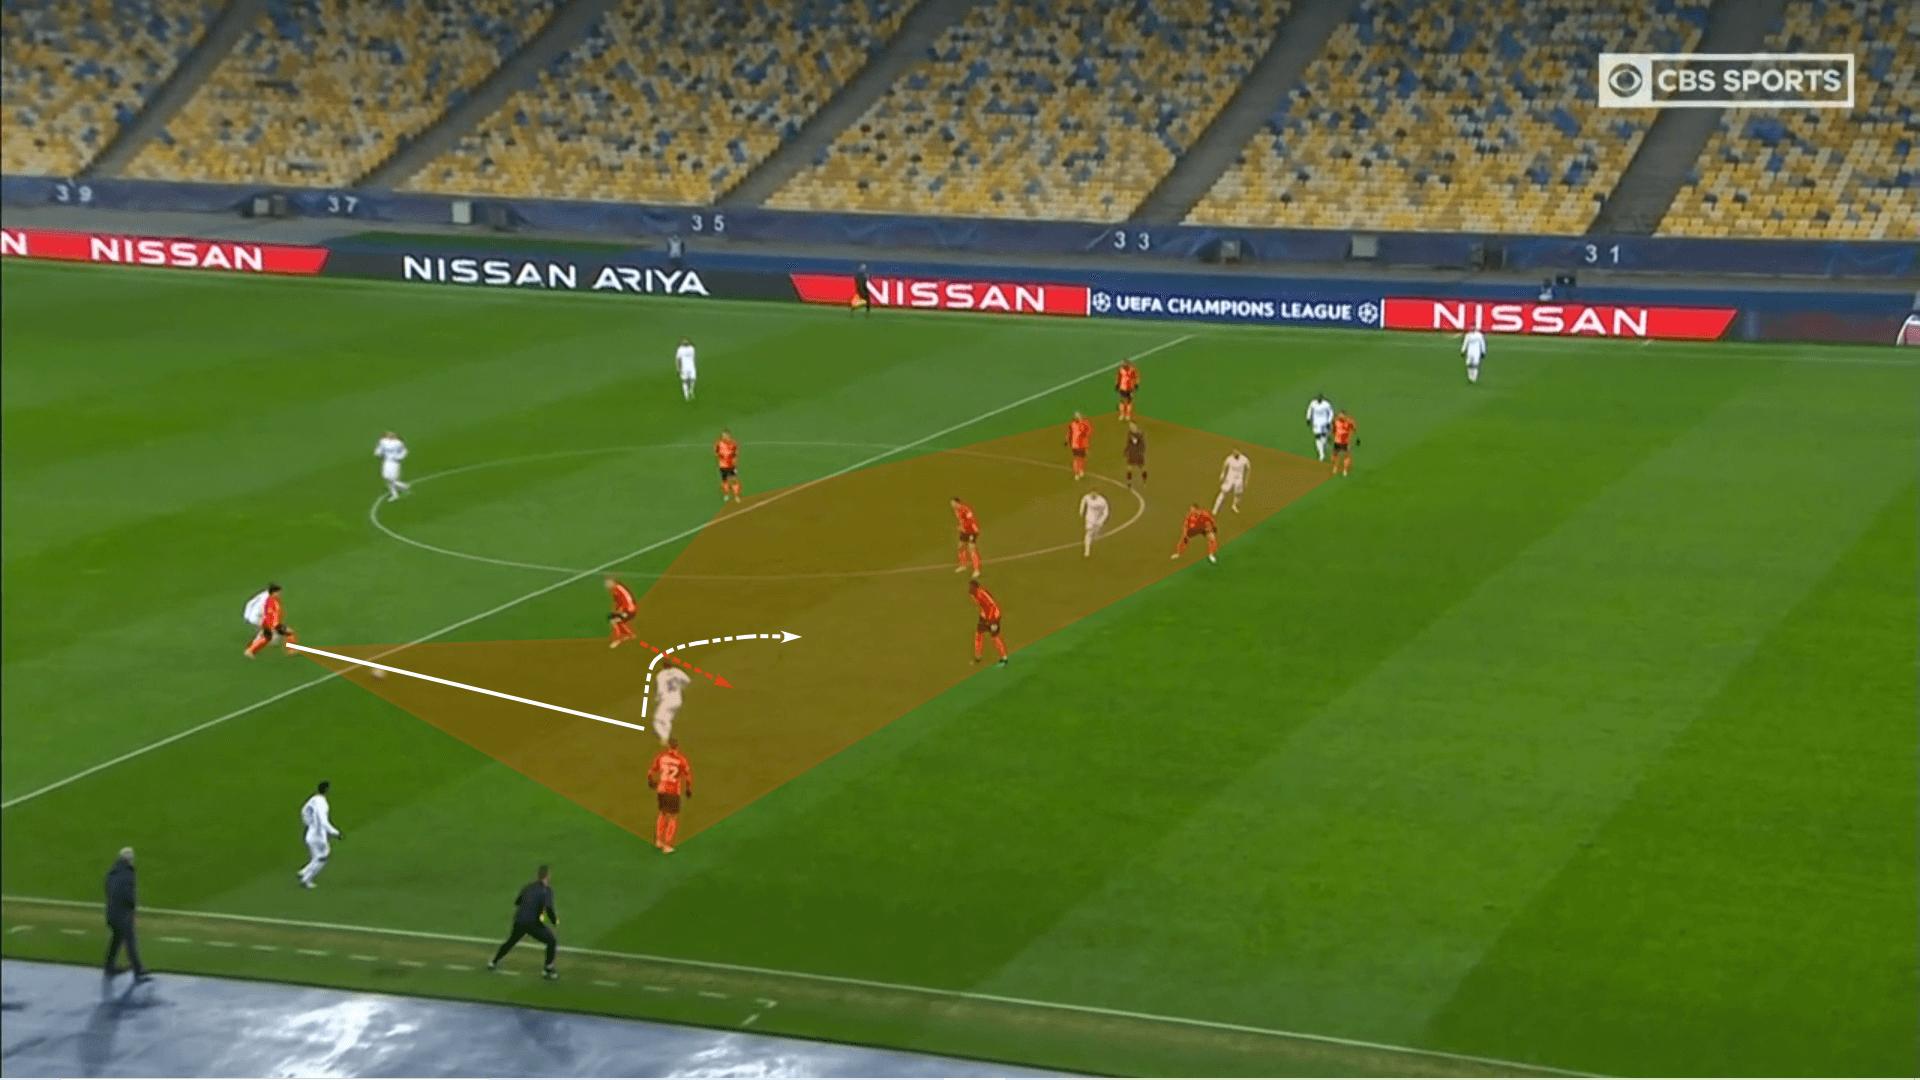 UEFA Champions League 2020/21: Shakhtar Donetsk vs Real Madrid – tactical analysis tactics